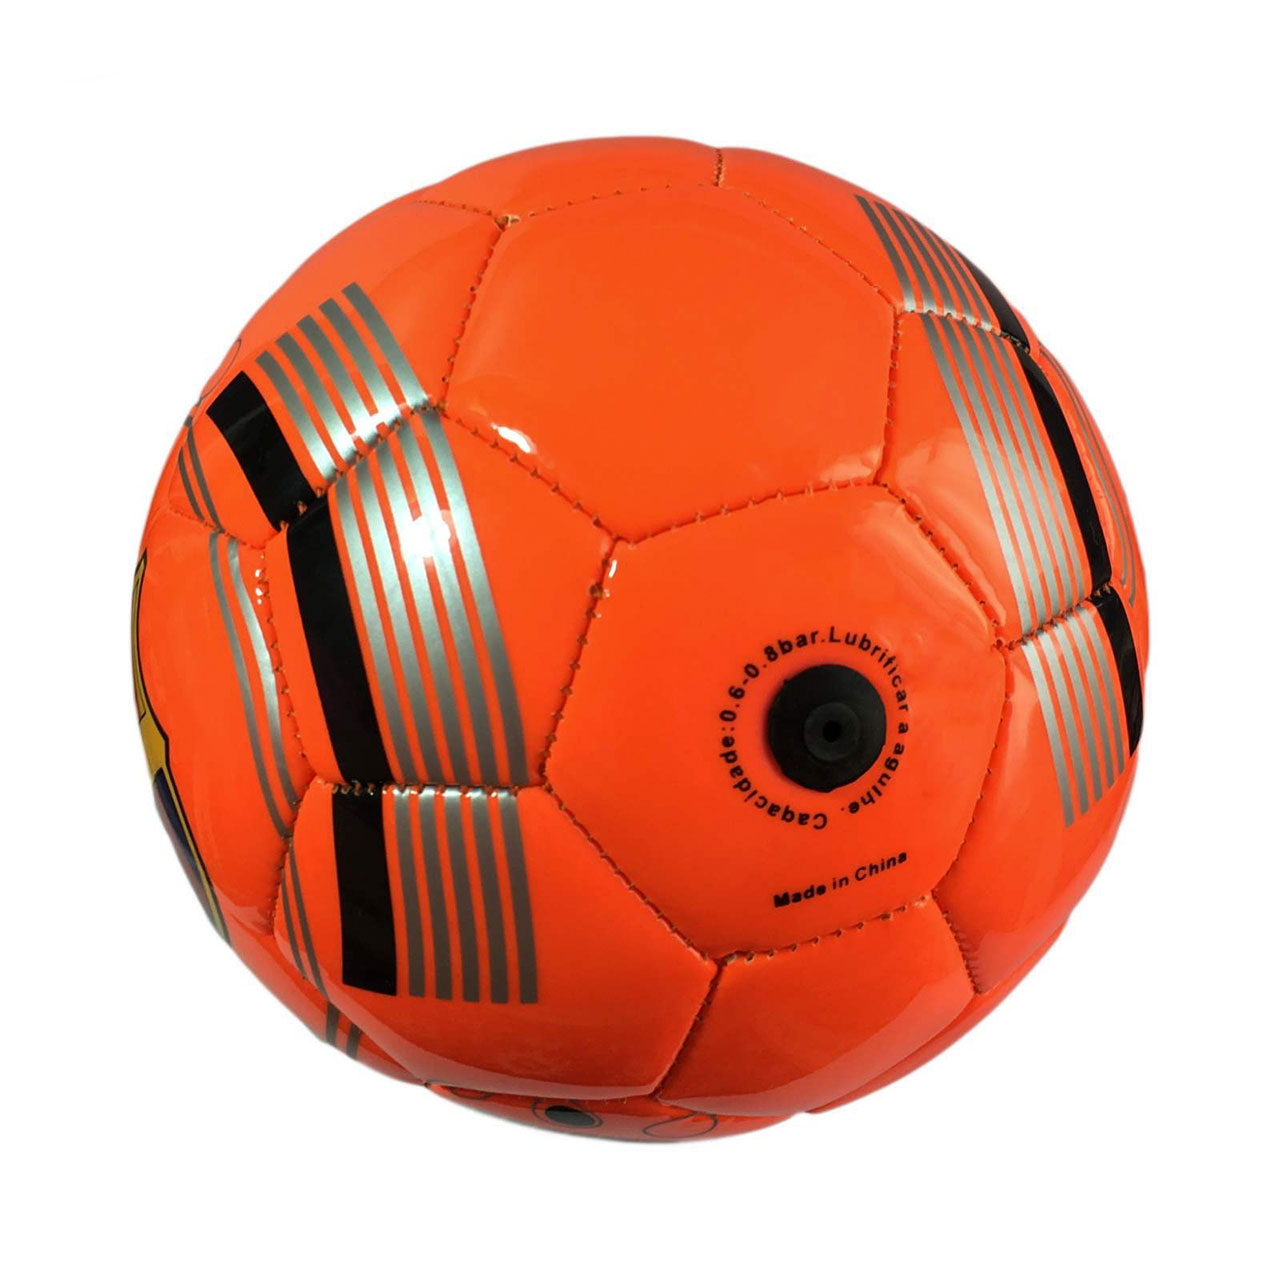 توپ فوتبال مدل dc28